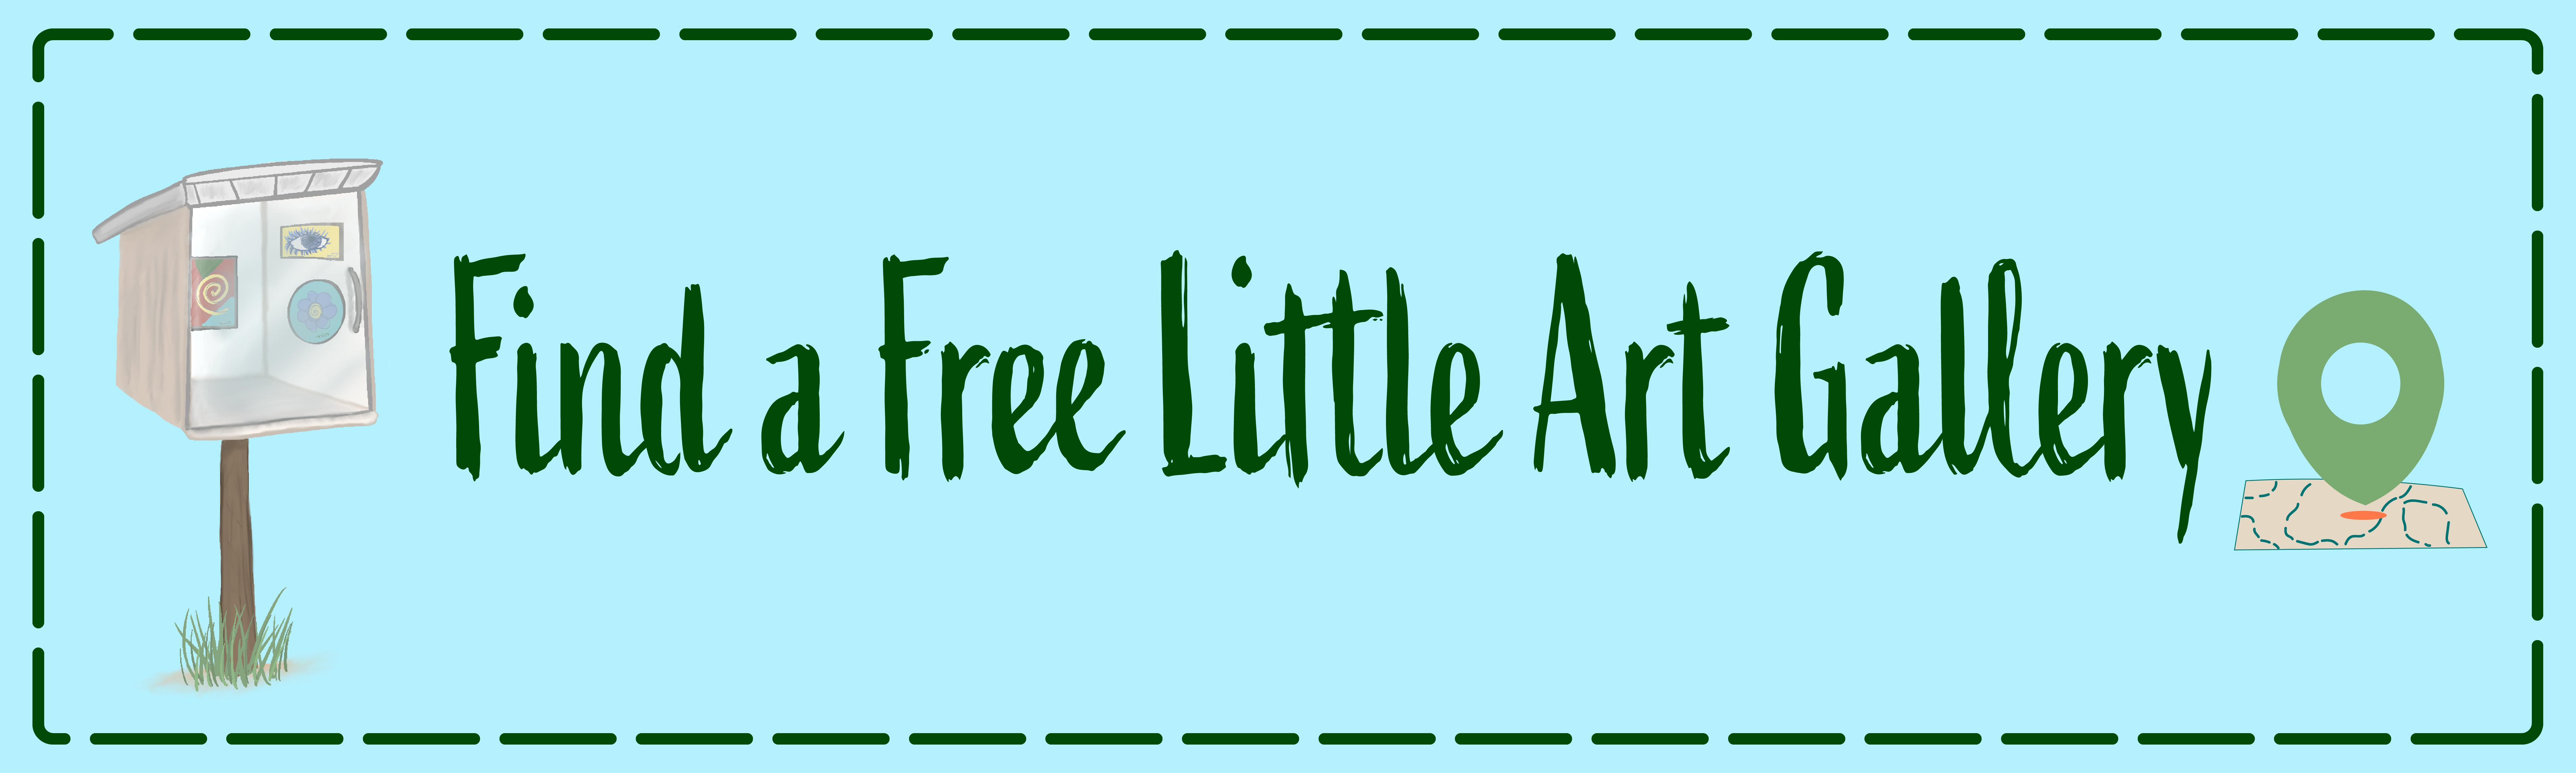 Find a Free Little Art Gallery website header image.